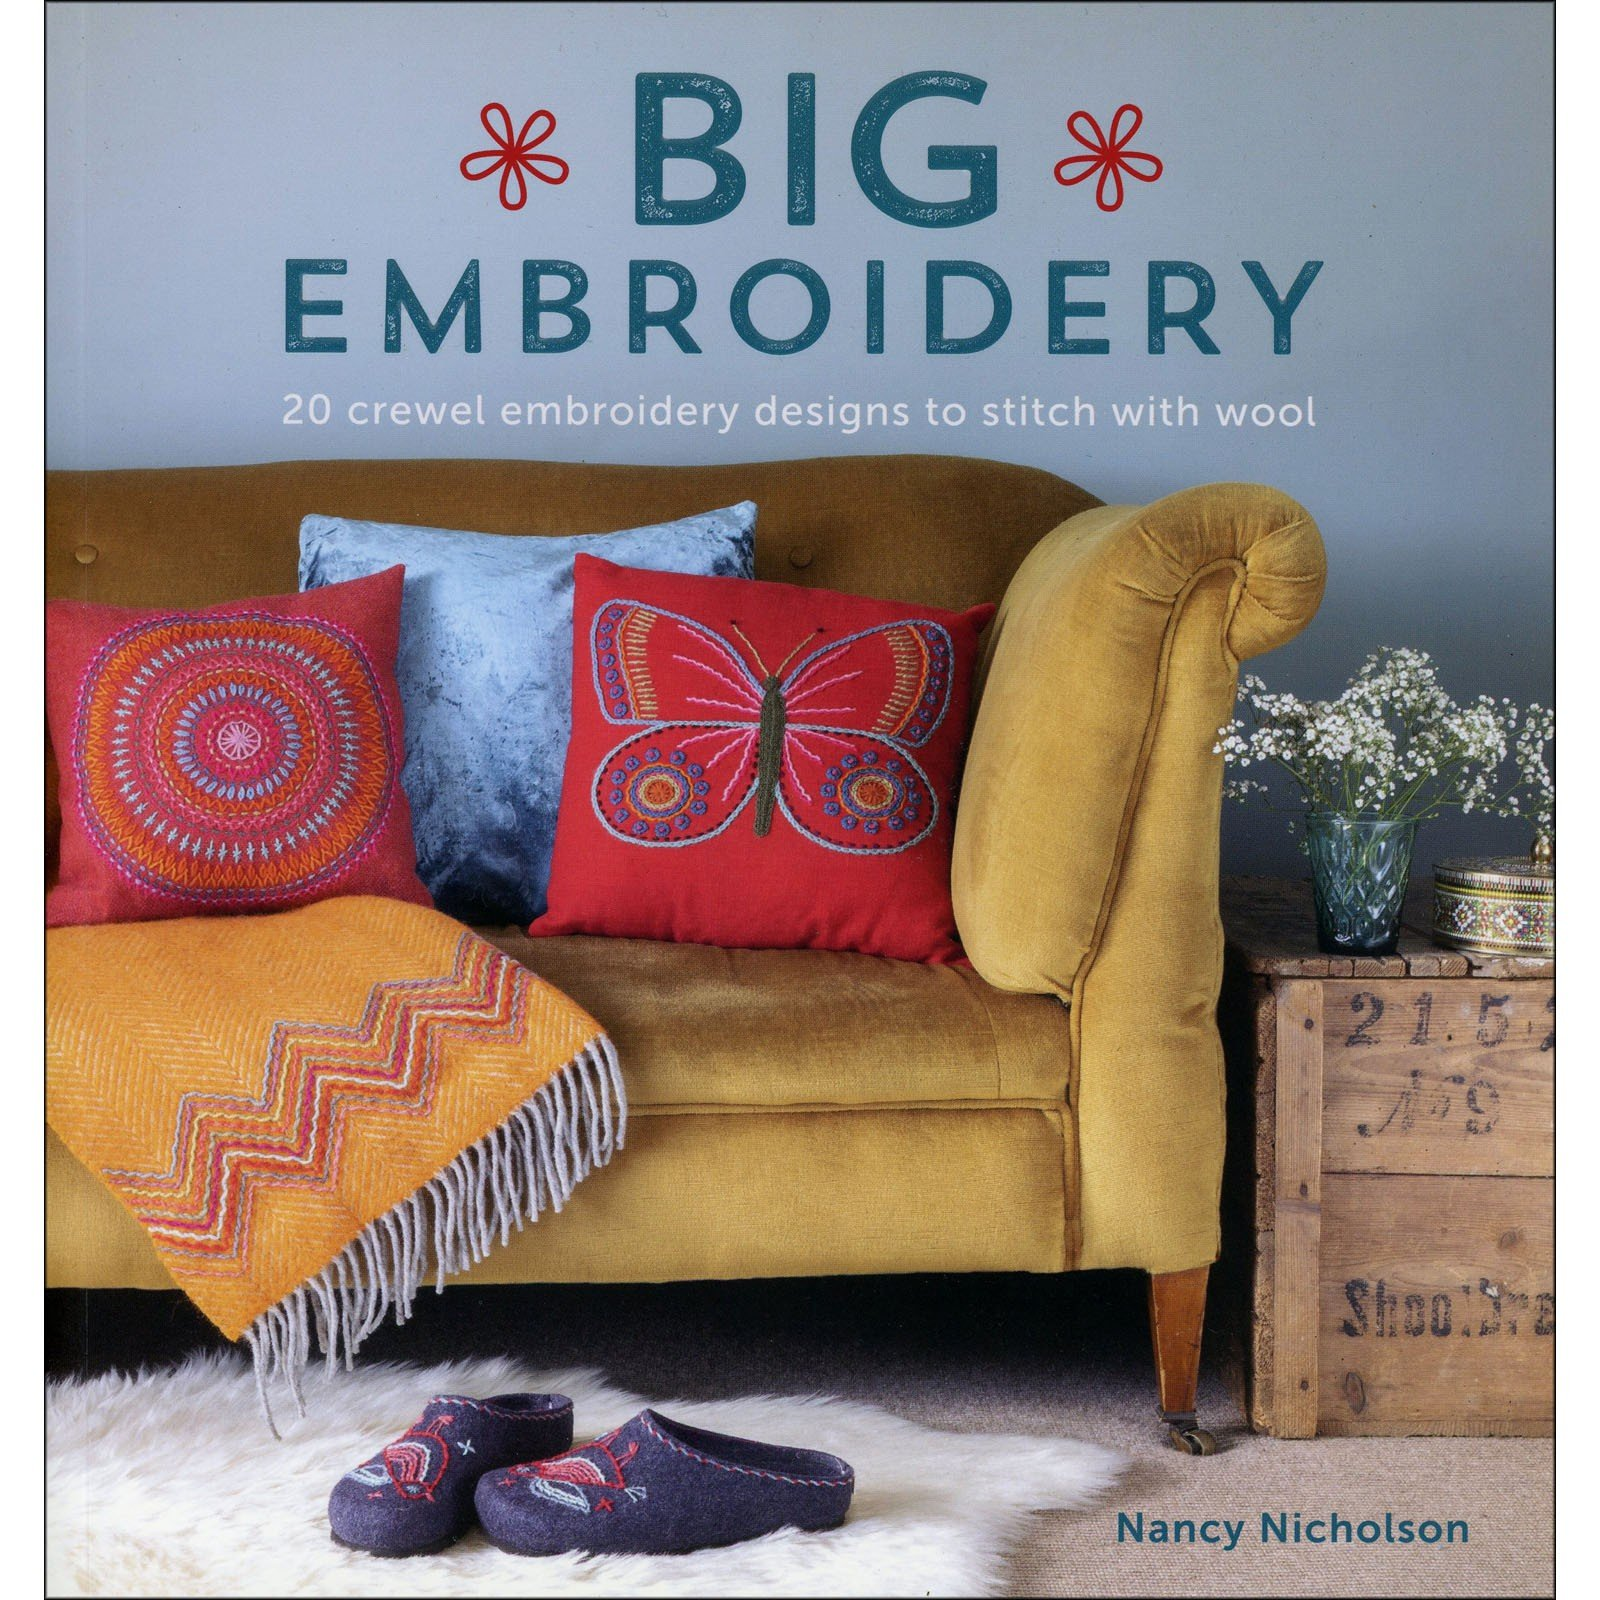 Book. Big Embroidery 20 Crewel Designs Nancy Nicholson